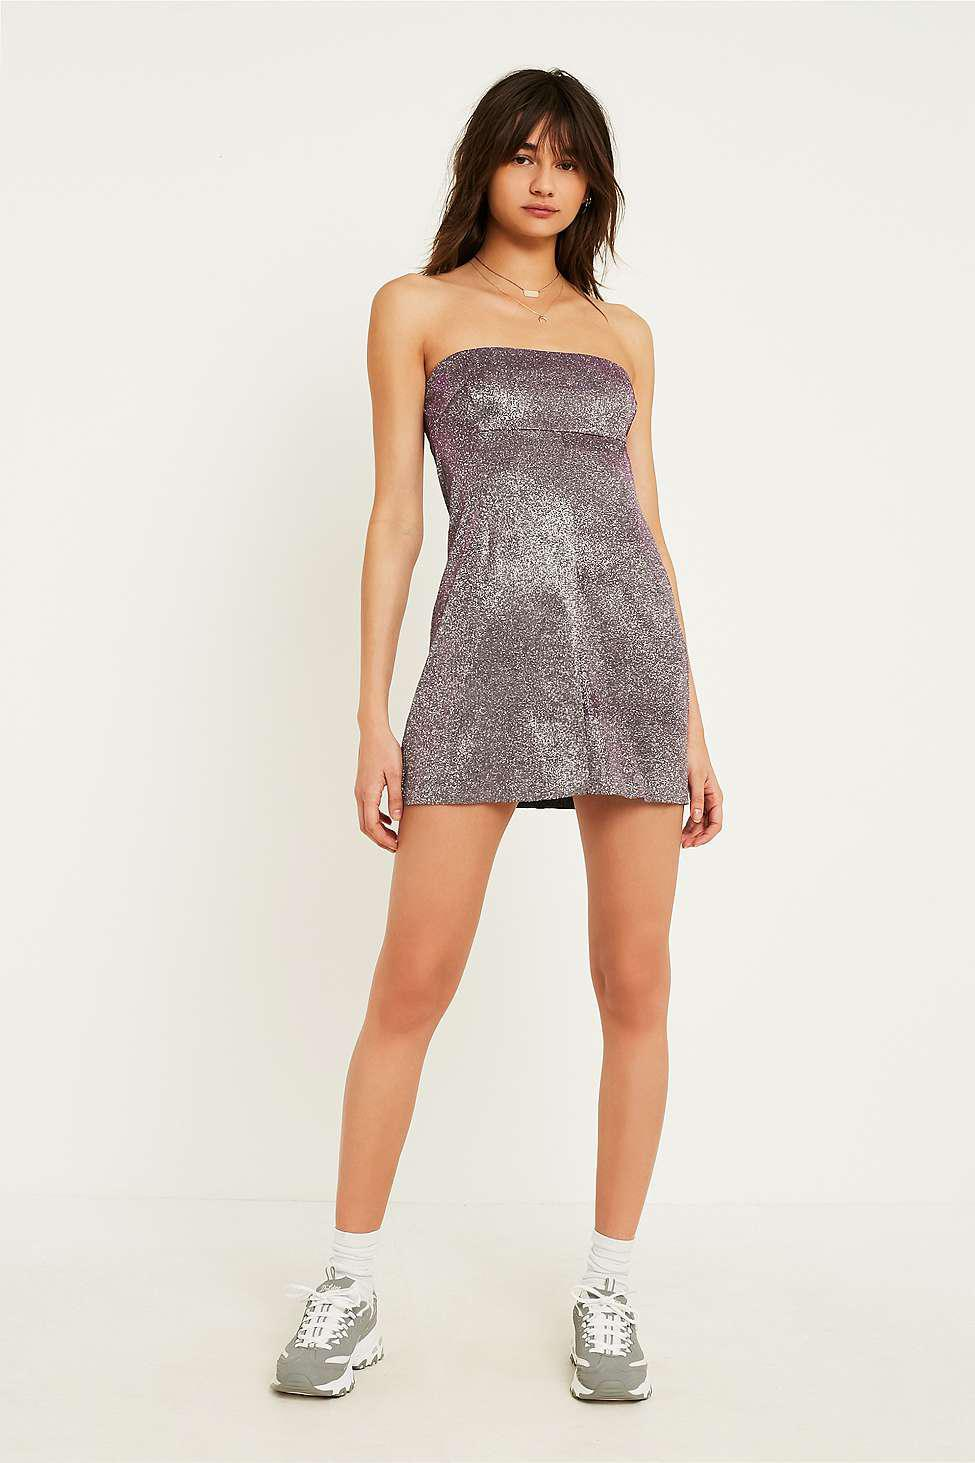 166c5bc8b8 Urban Outfitters Uo Moonbeam Metallic Tube Top Dress - Womens M in ...